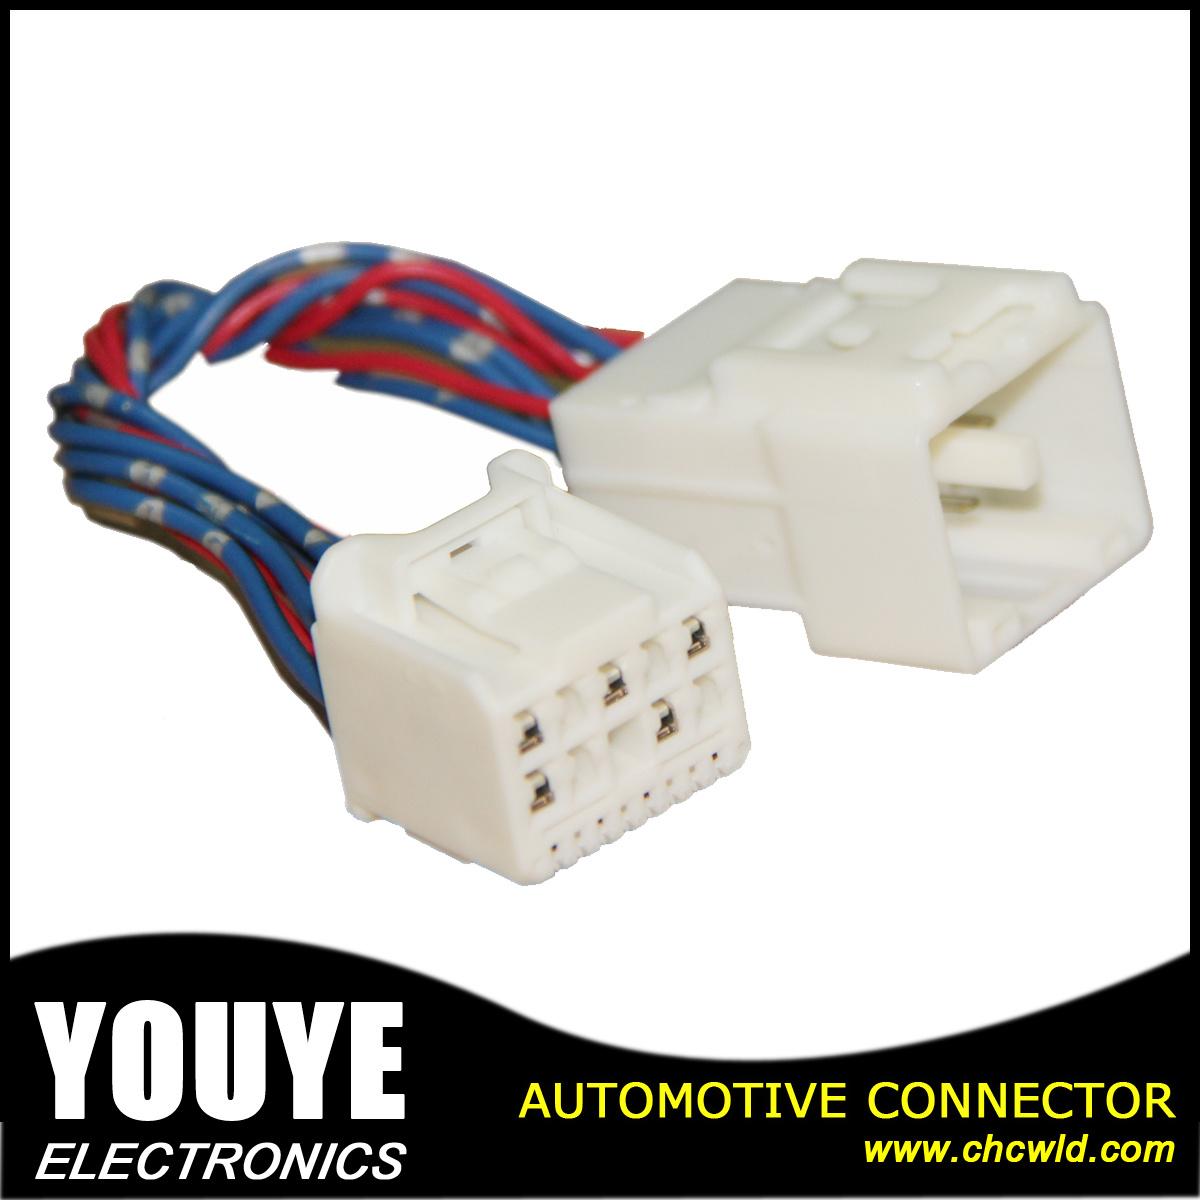 toyota wiring harness china toyota corolla customize wiring harness china toyota toyota wiring harness class action suit toyota corolla customize wiring harness